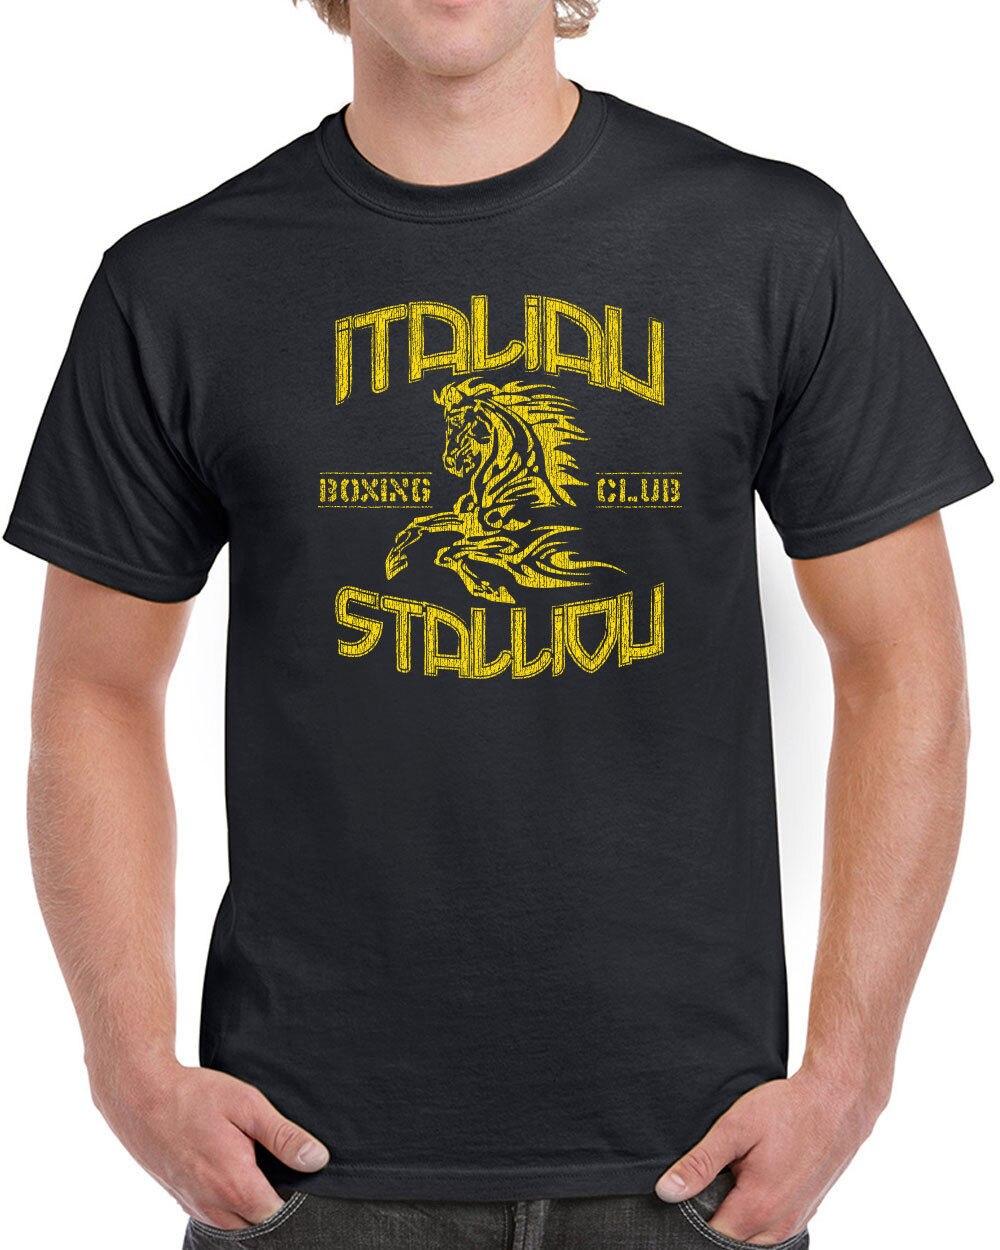 Design t shirt rewang - Design T Shirt Rewang Crew Shirt Desain Download Image Design T